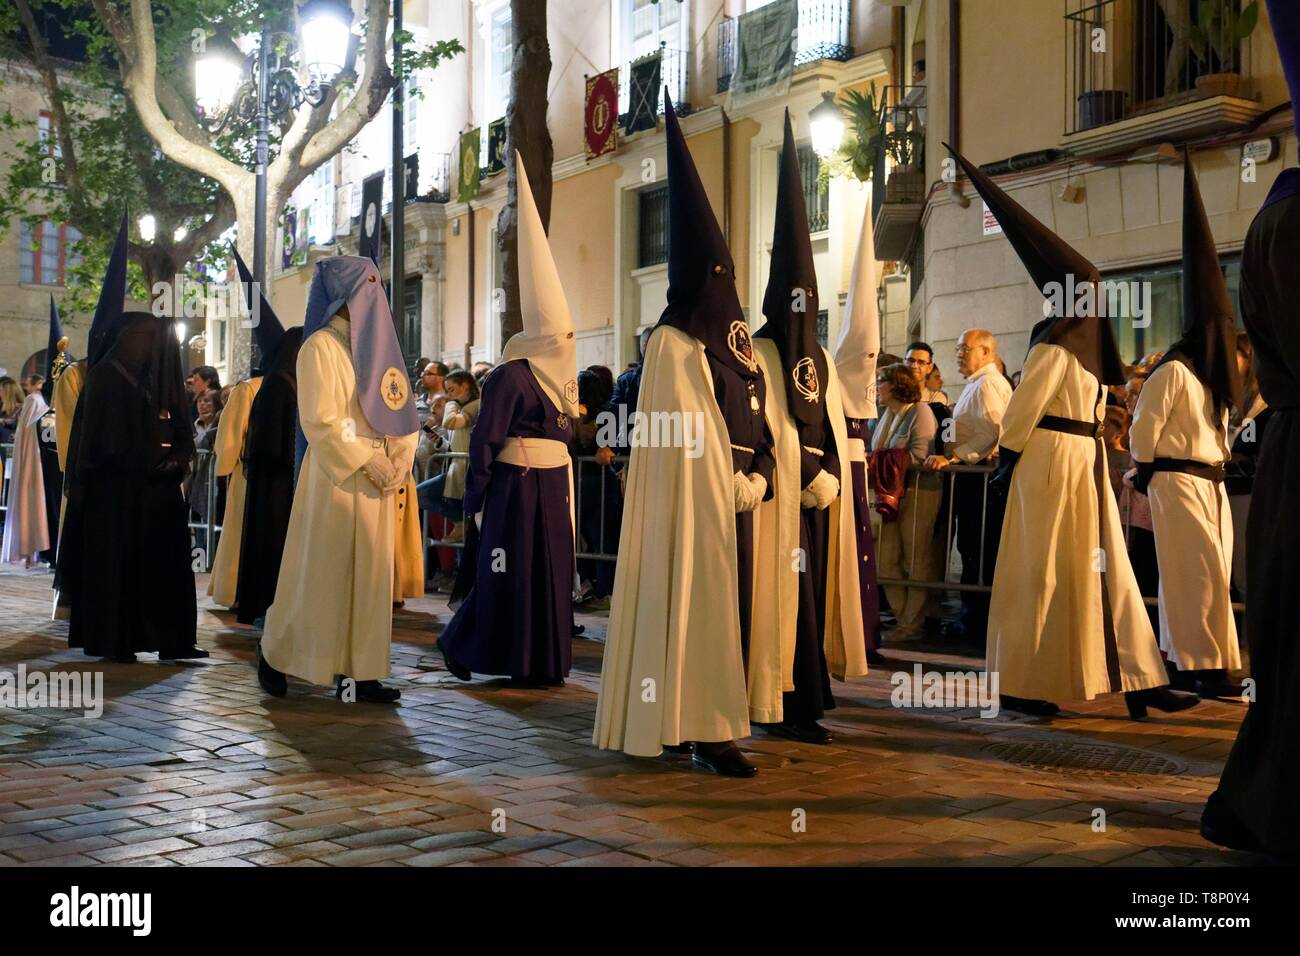 Spanien, Aragonien, Provinz Zaragoza, Zaragoza, der Semana Santa (Karwoche) feiern Stockfoto